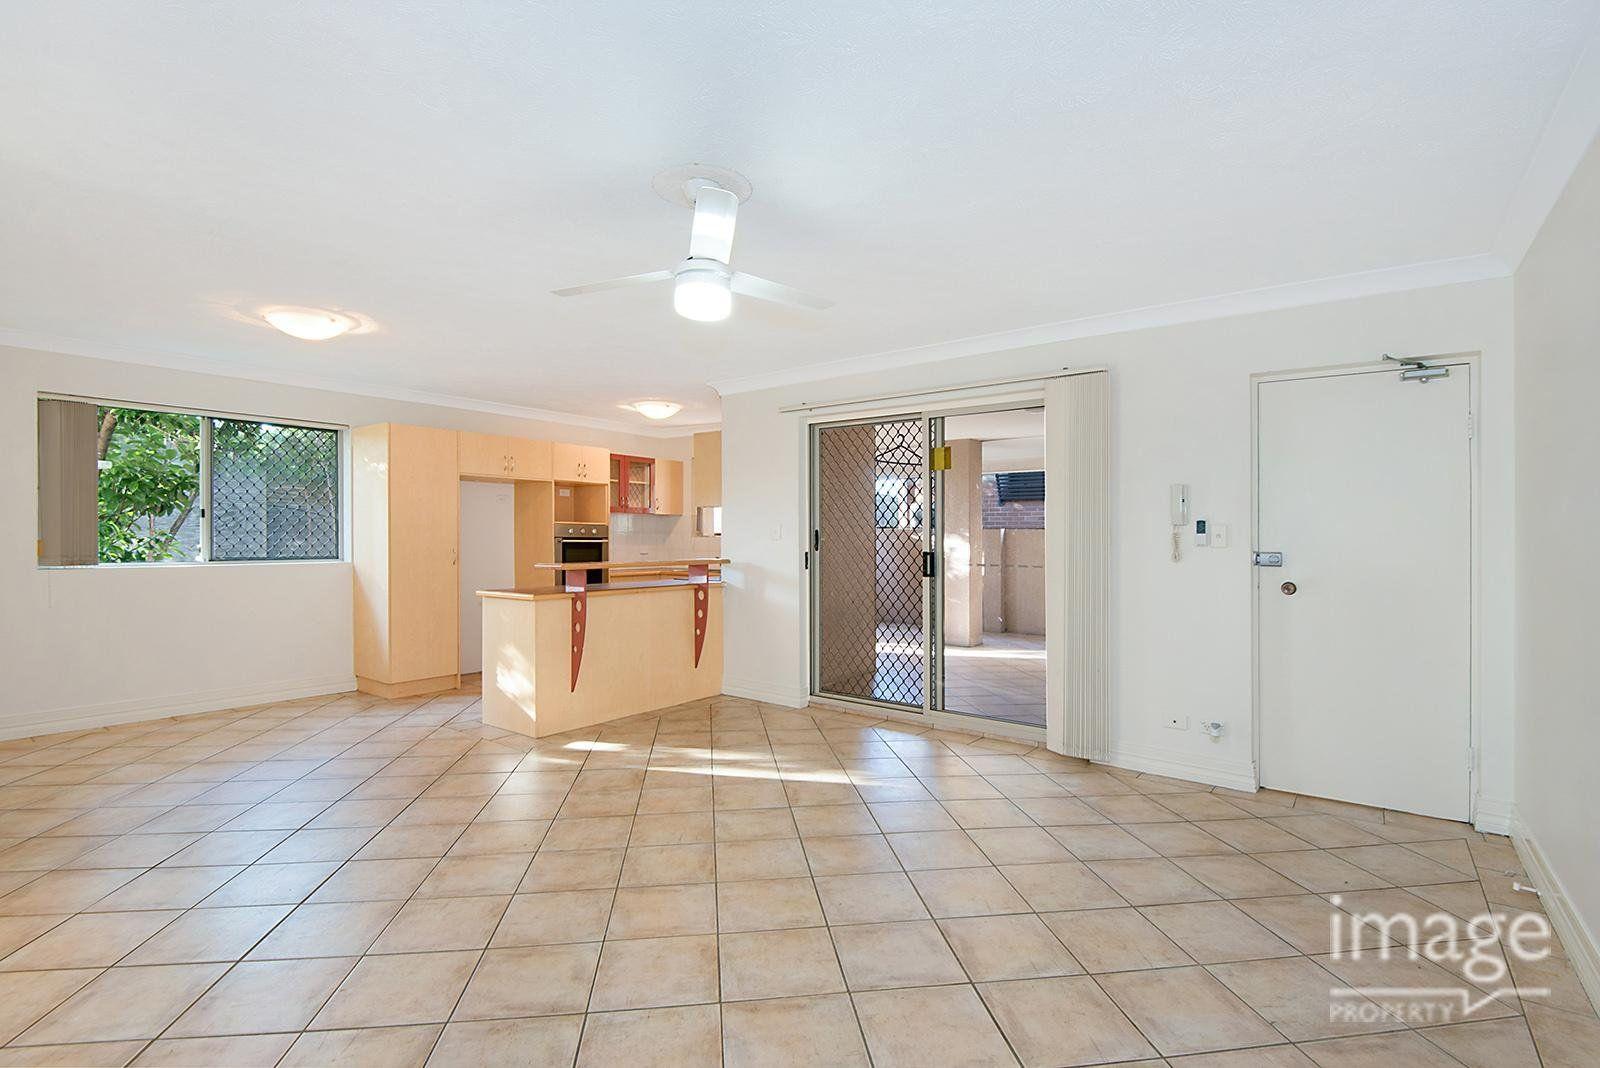 15 Cardross Street, Yeerongpilly QLD 4105, Image 0